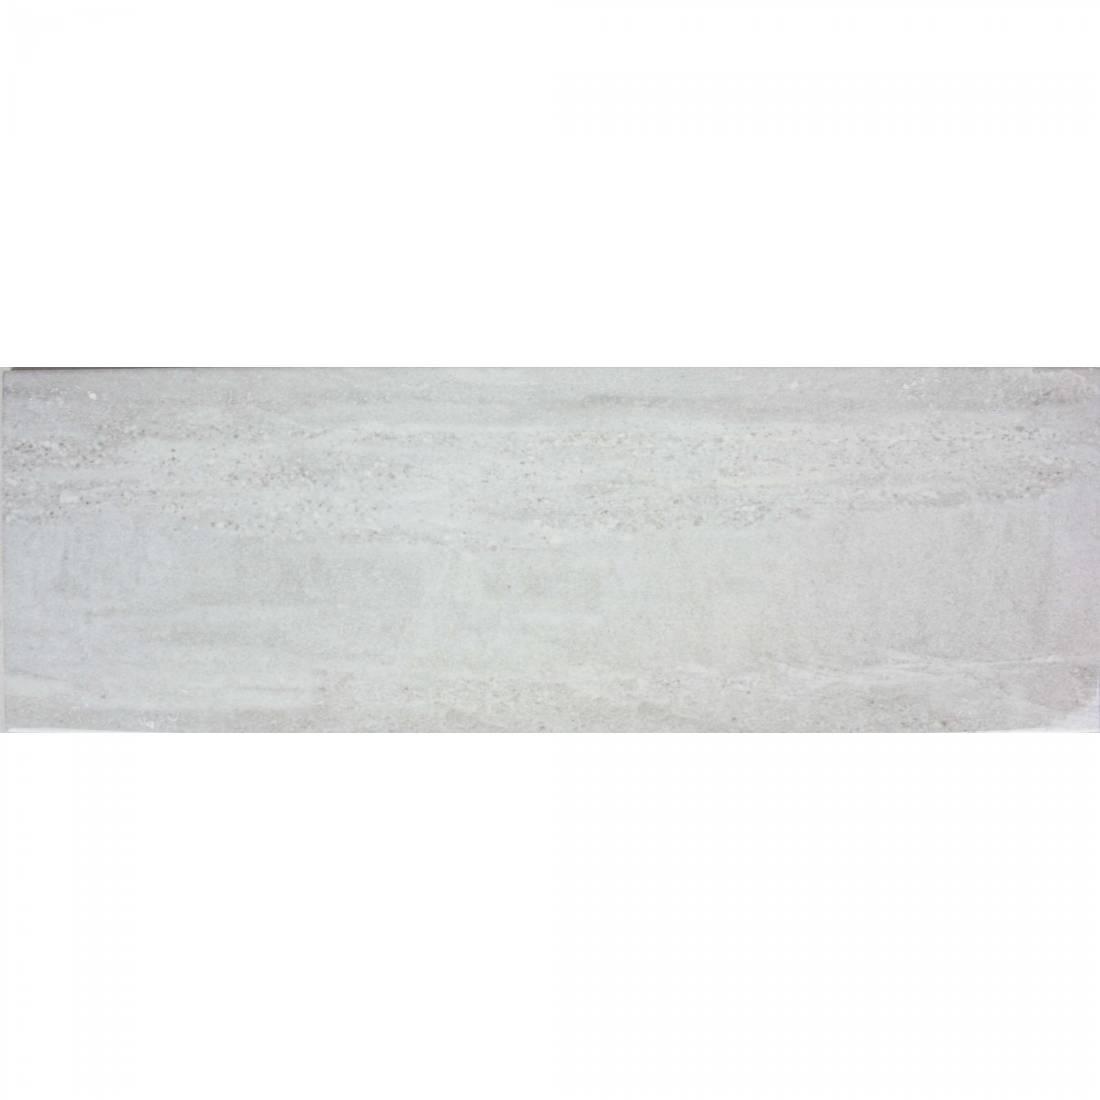 Darwin 20x60 White Gloss 1